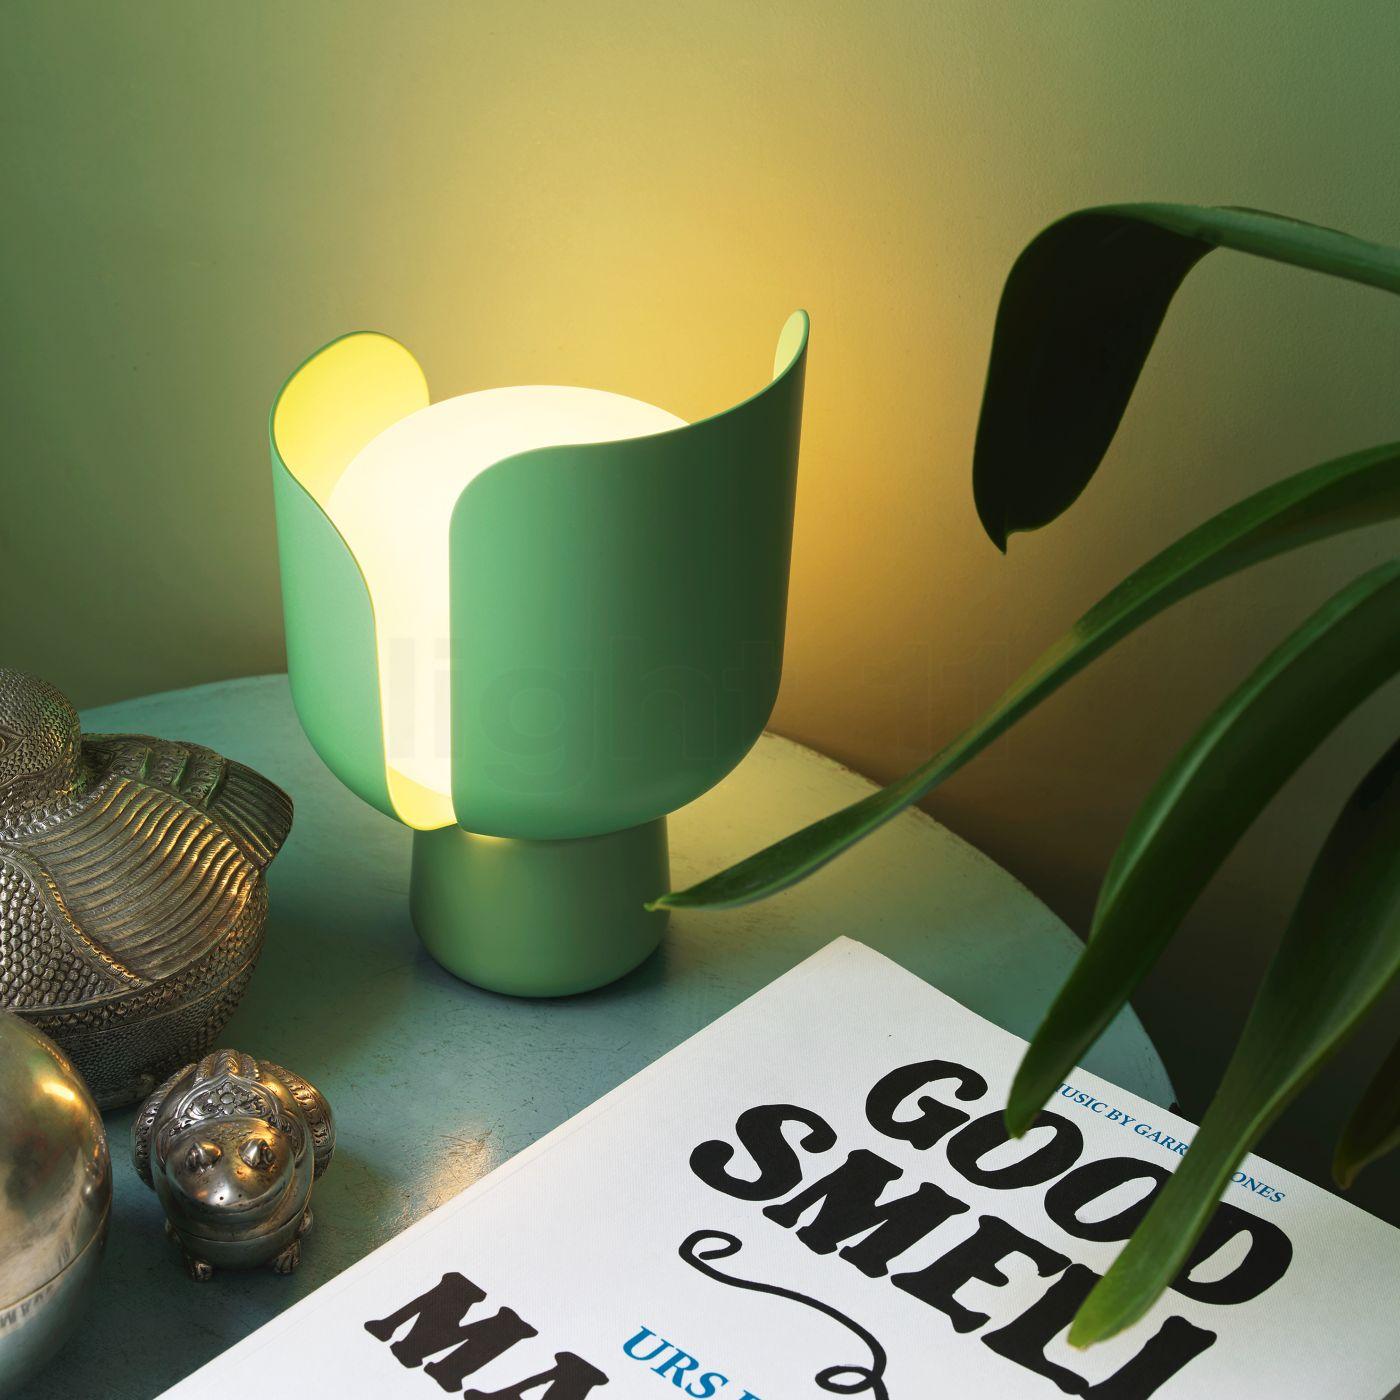 Blom Sur Table Fontana En Arte De Vente Lampe rCBedxWo